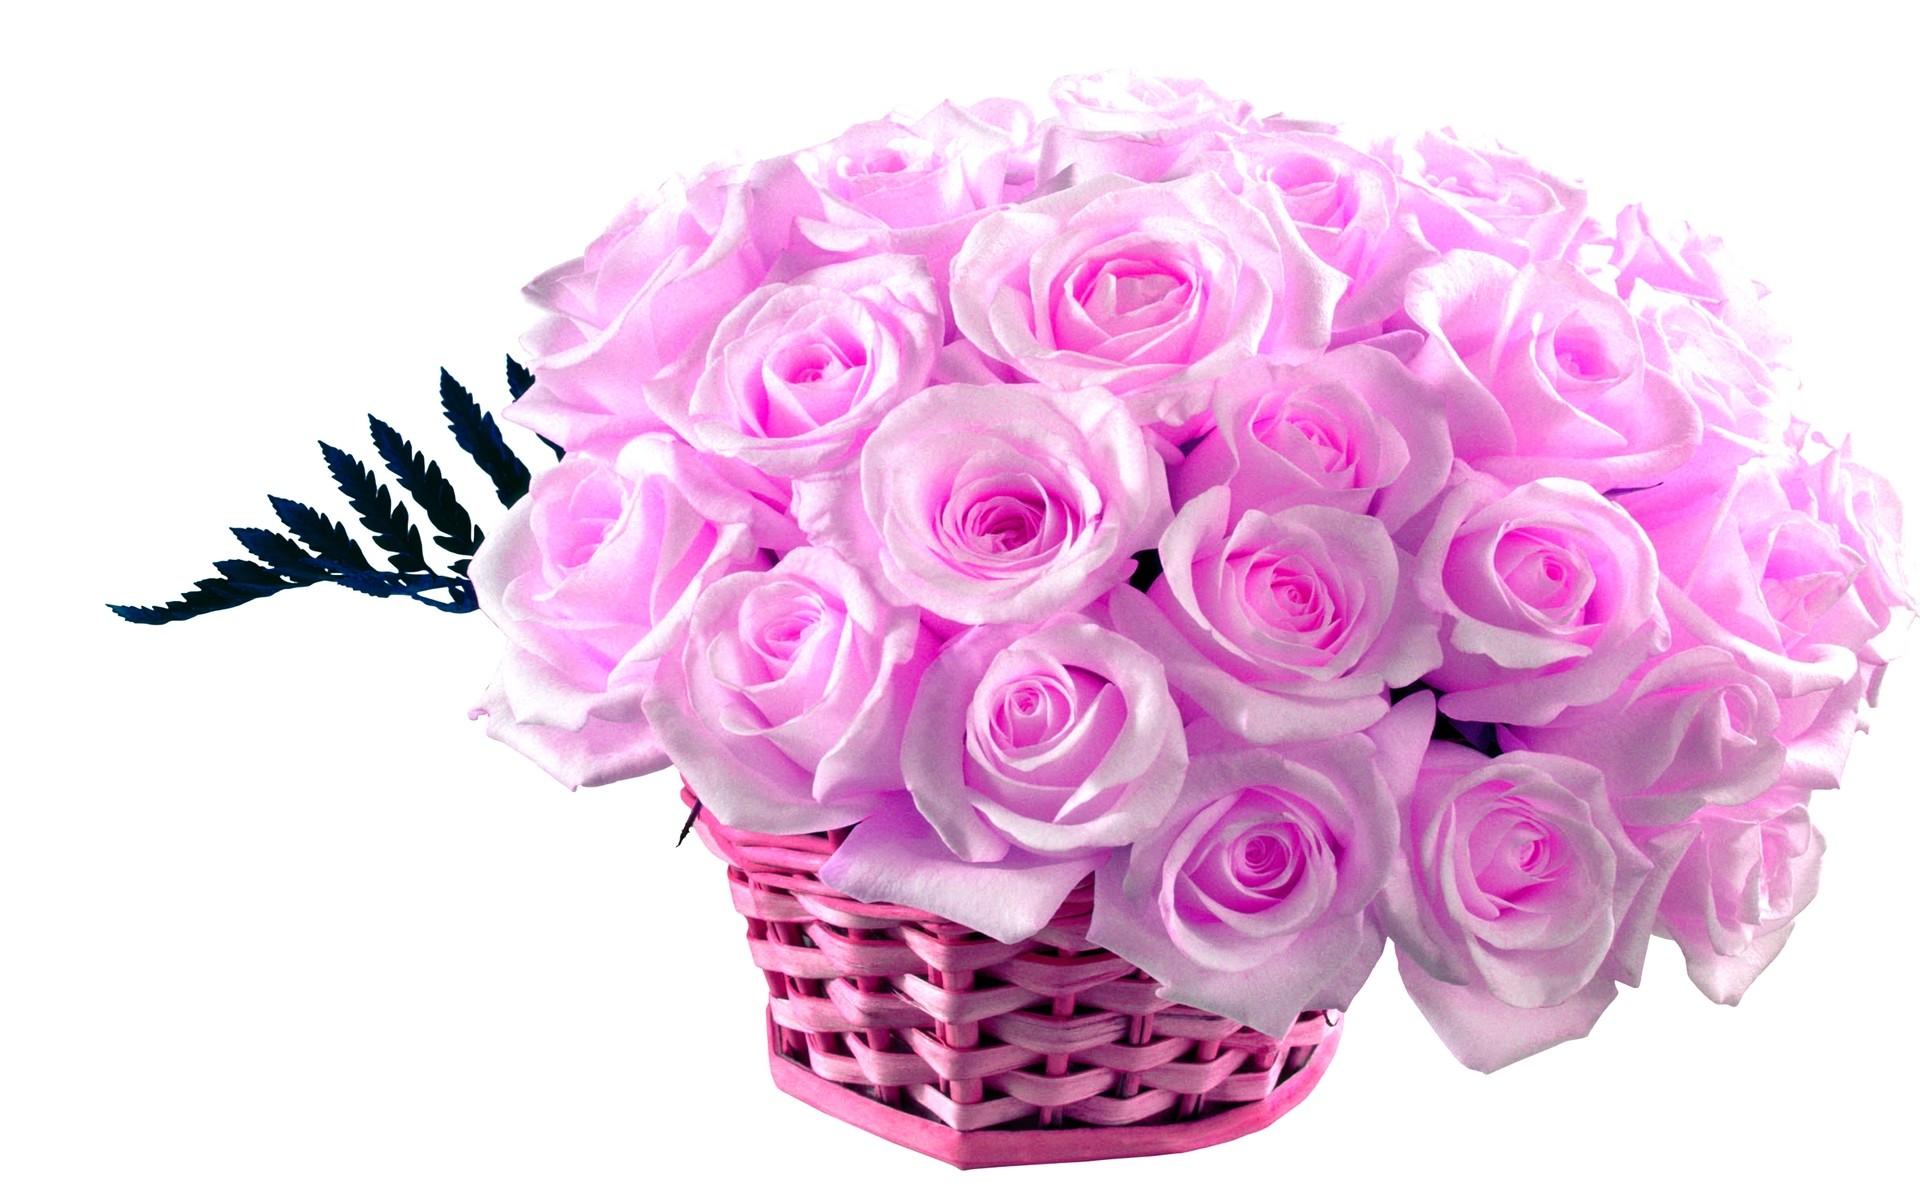 2560x1600 Pink Roses Wallpaper HD